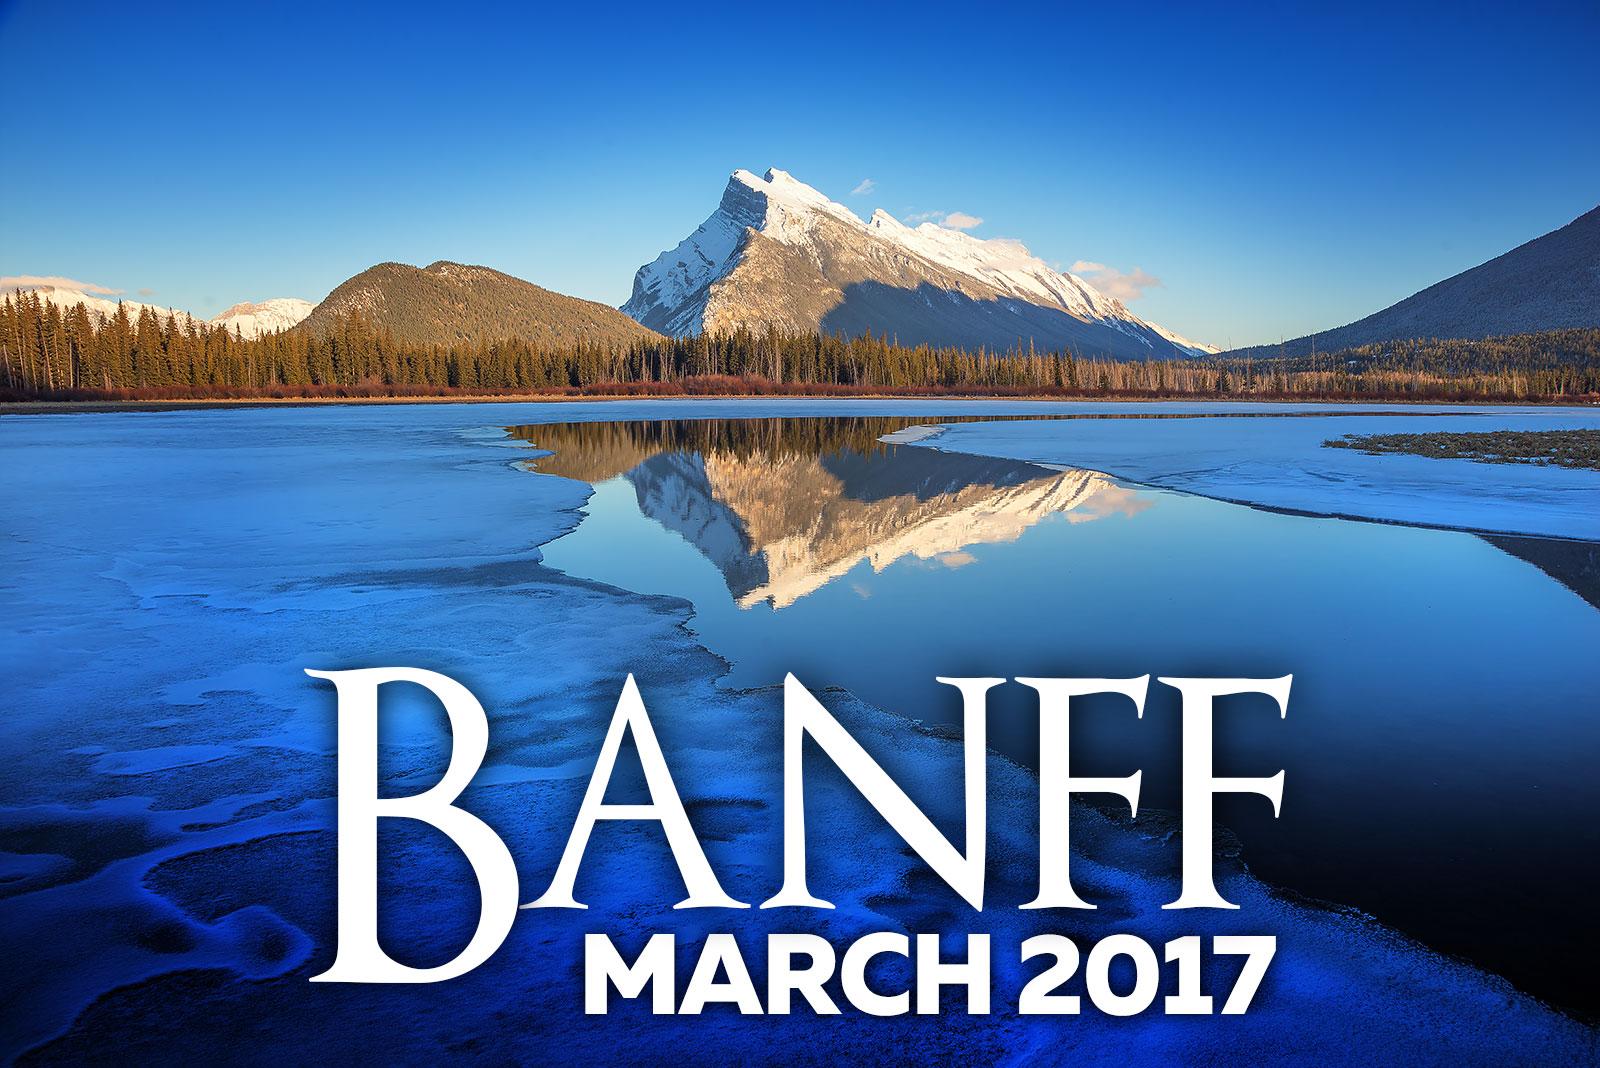 Banff Photography Workshops 2017